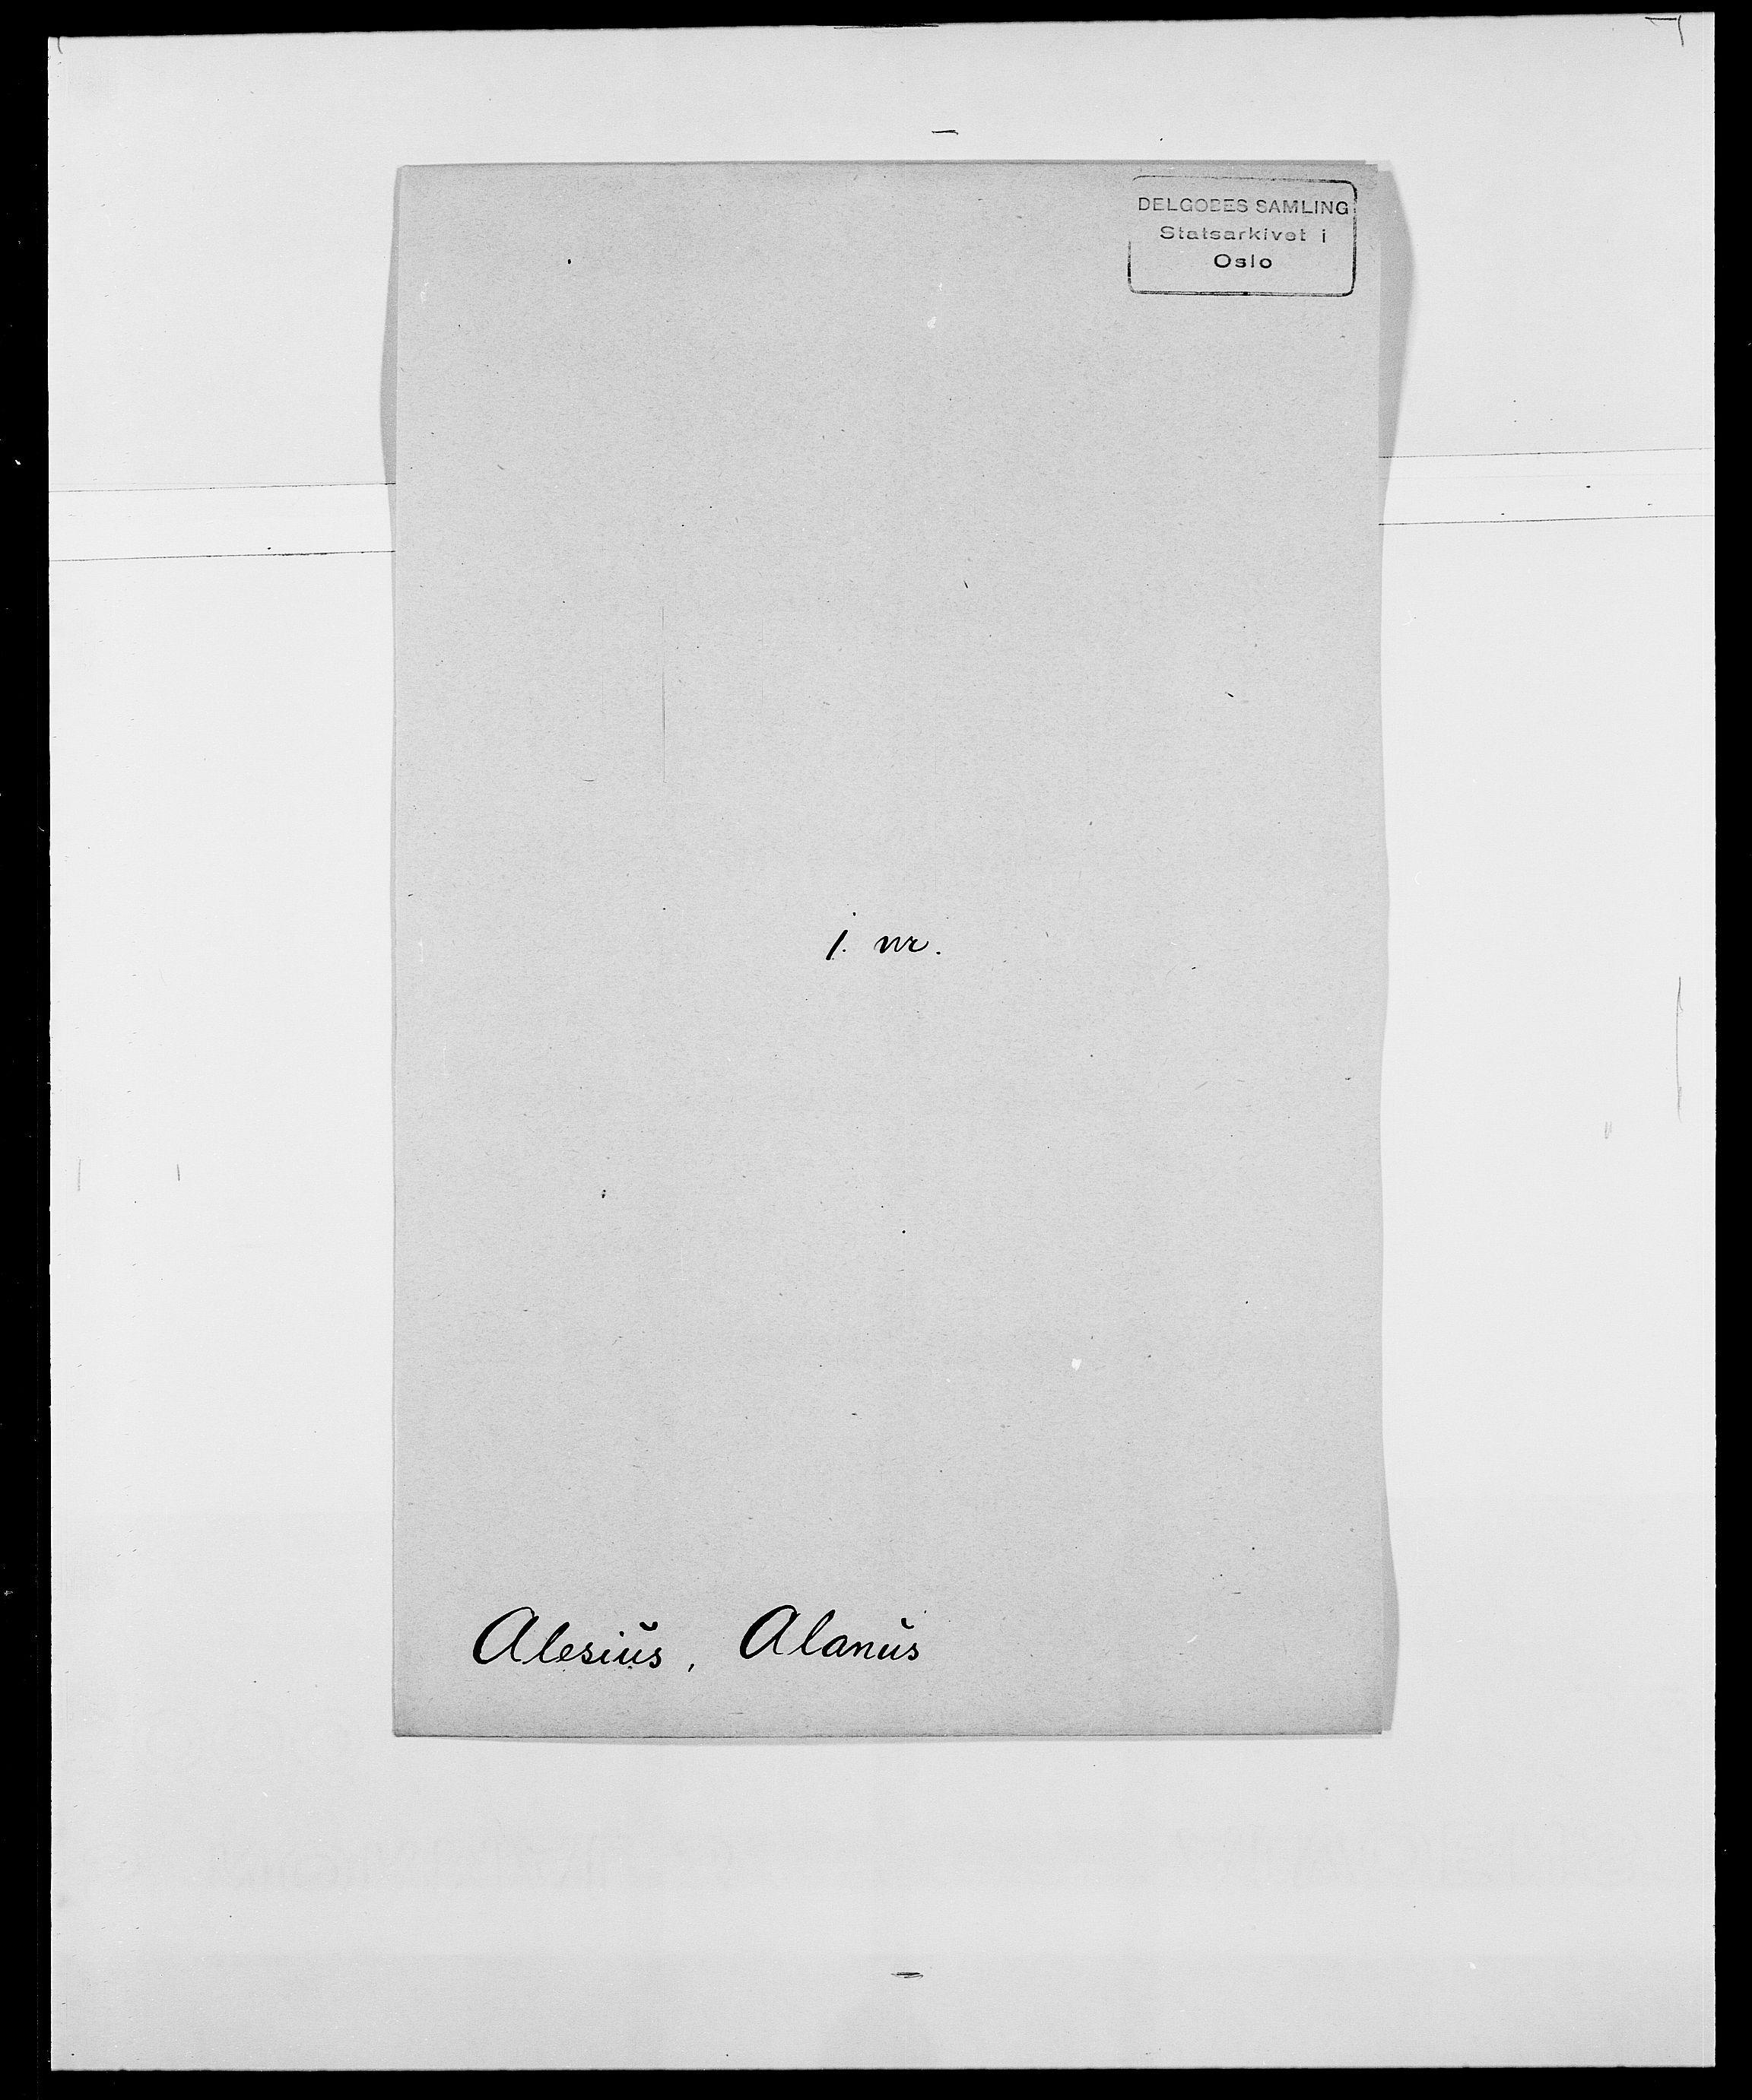 SAO, Delgobe, Charles Antoine - samling, D/Da/L0001: Aabye - Angerman, s. 388